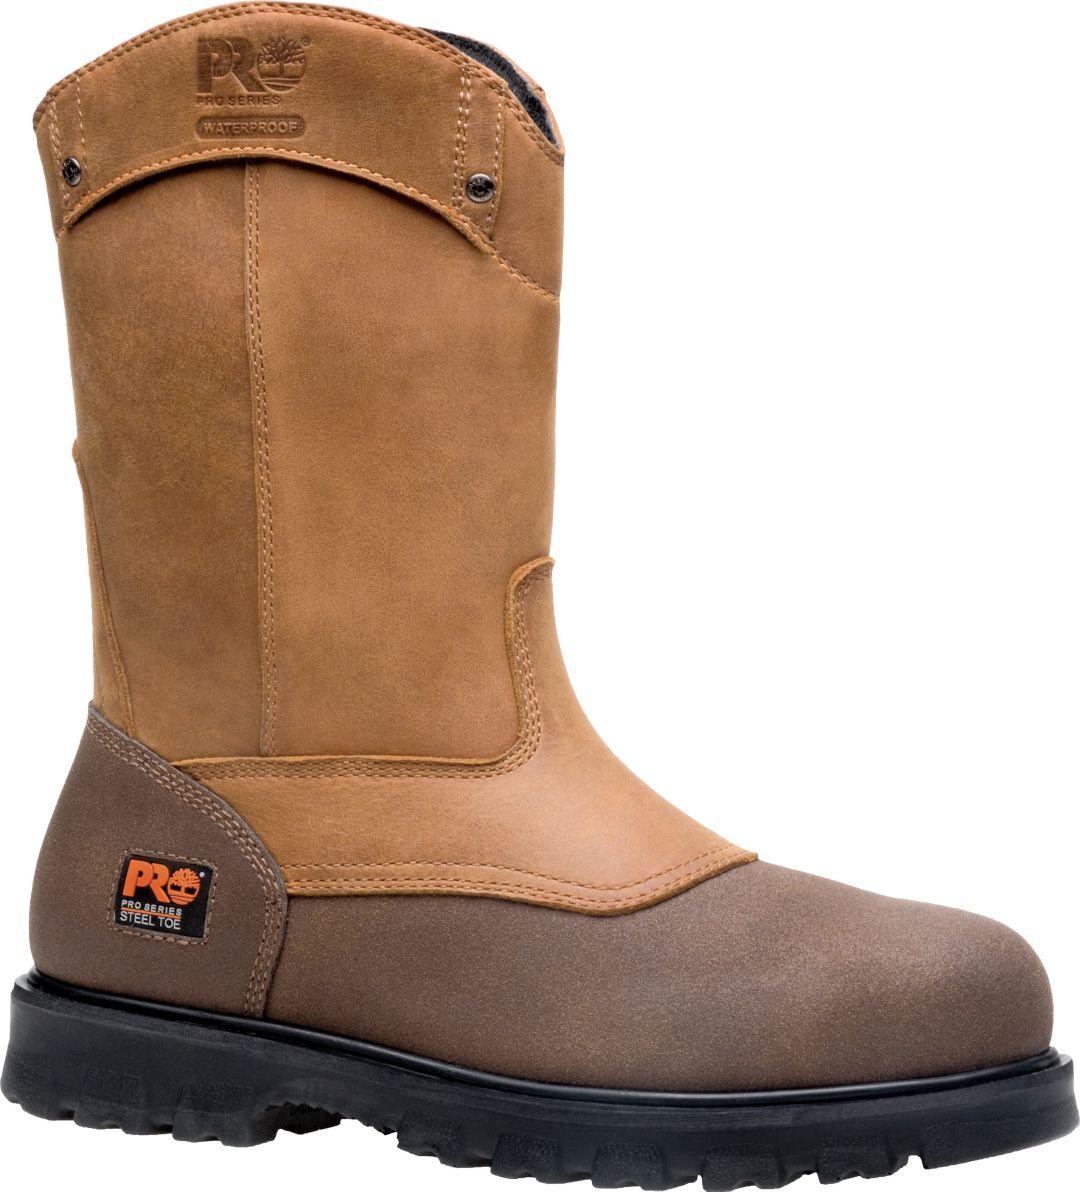 Timberland PRO Rigmaster Work Boot | Metatarsal Boot Store